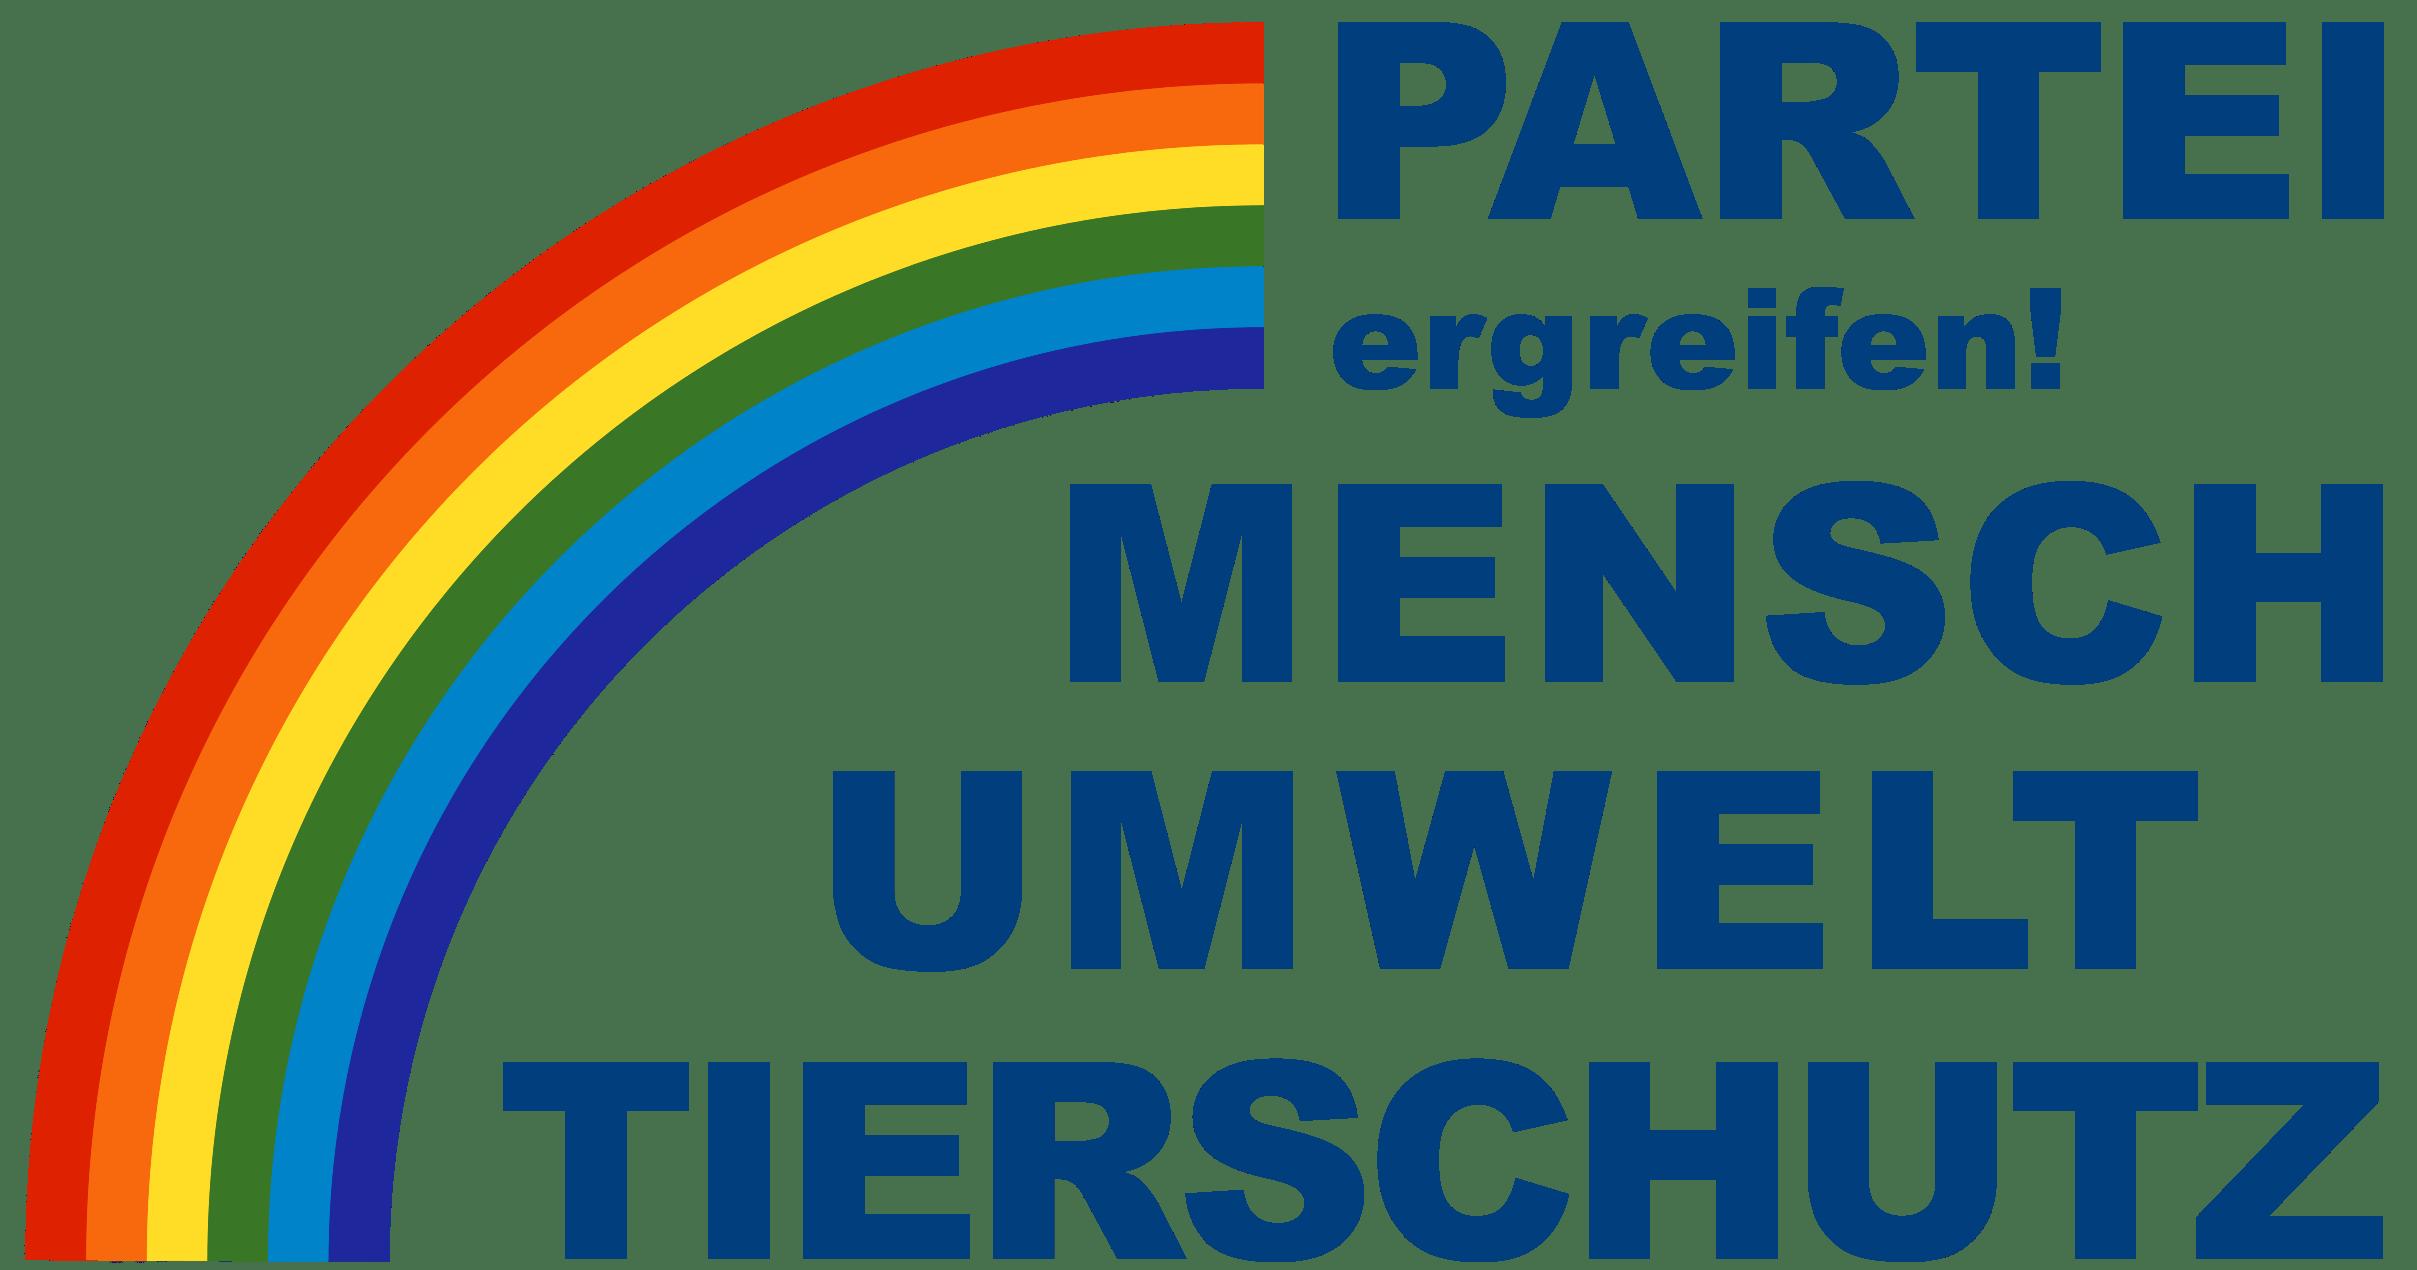 Partei Mensch Umwelt Tierschutz Logo